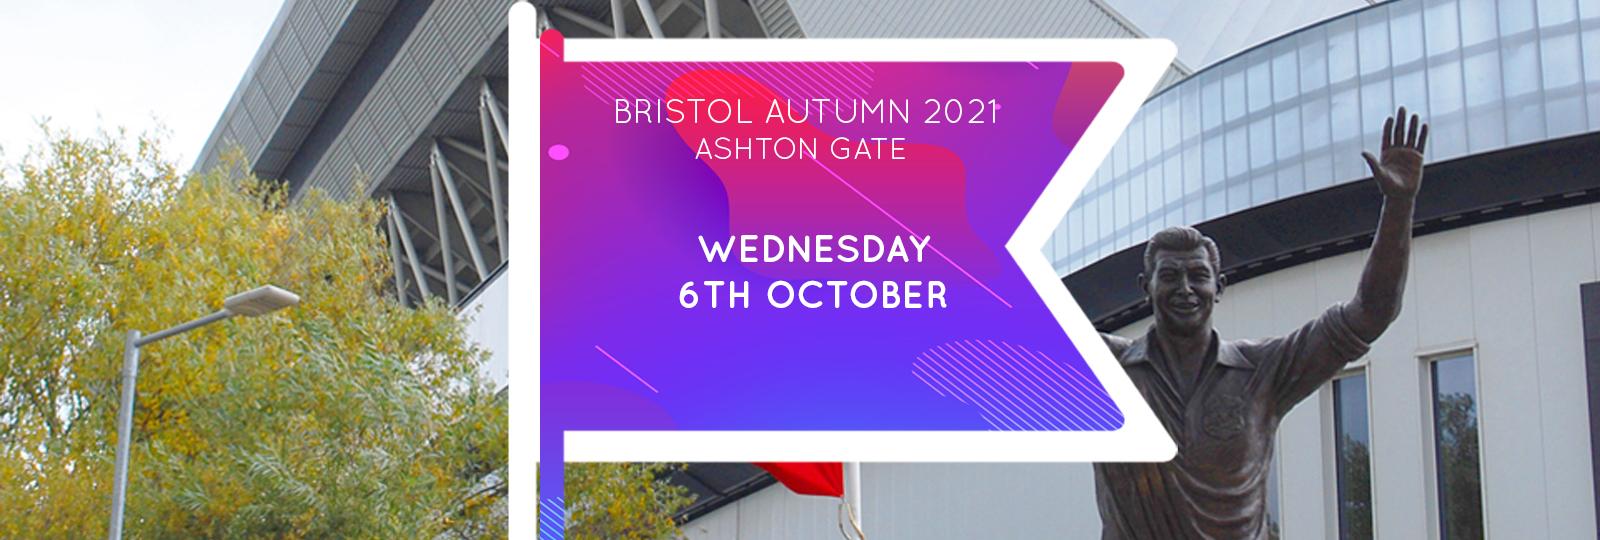 Bristol Autumn 2021 Fair